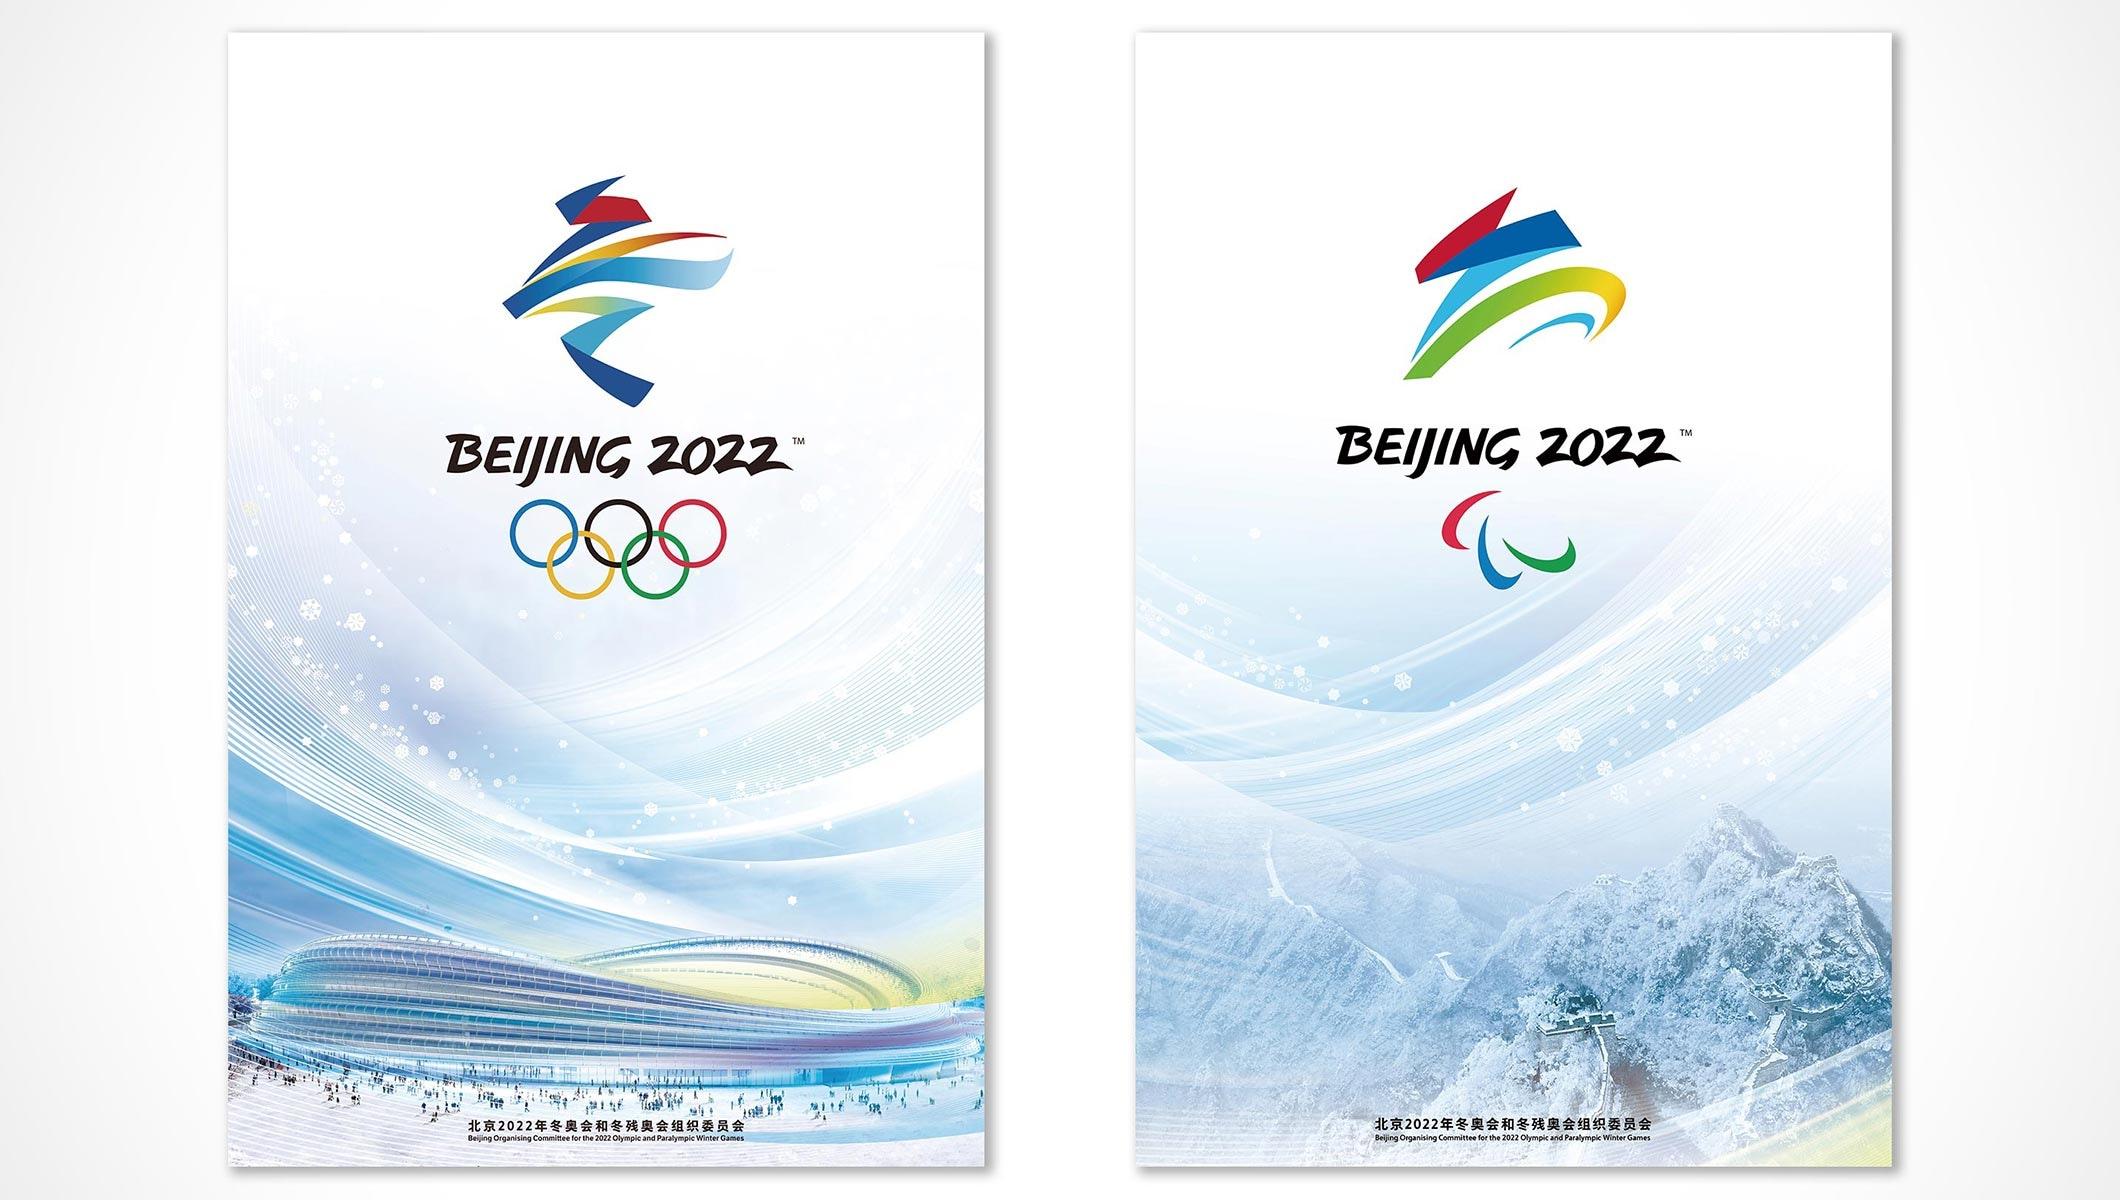 Official Beijing 2022 poster